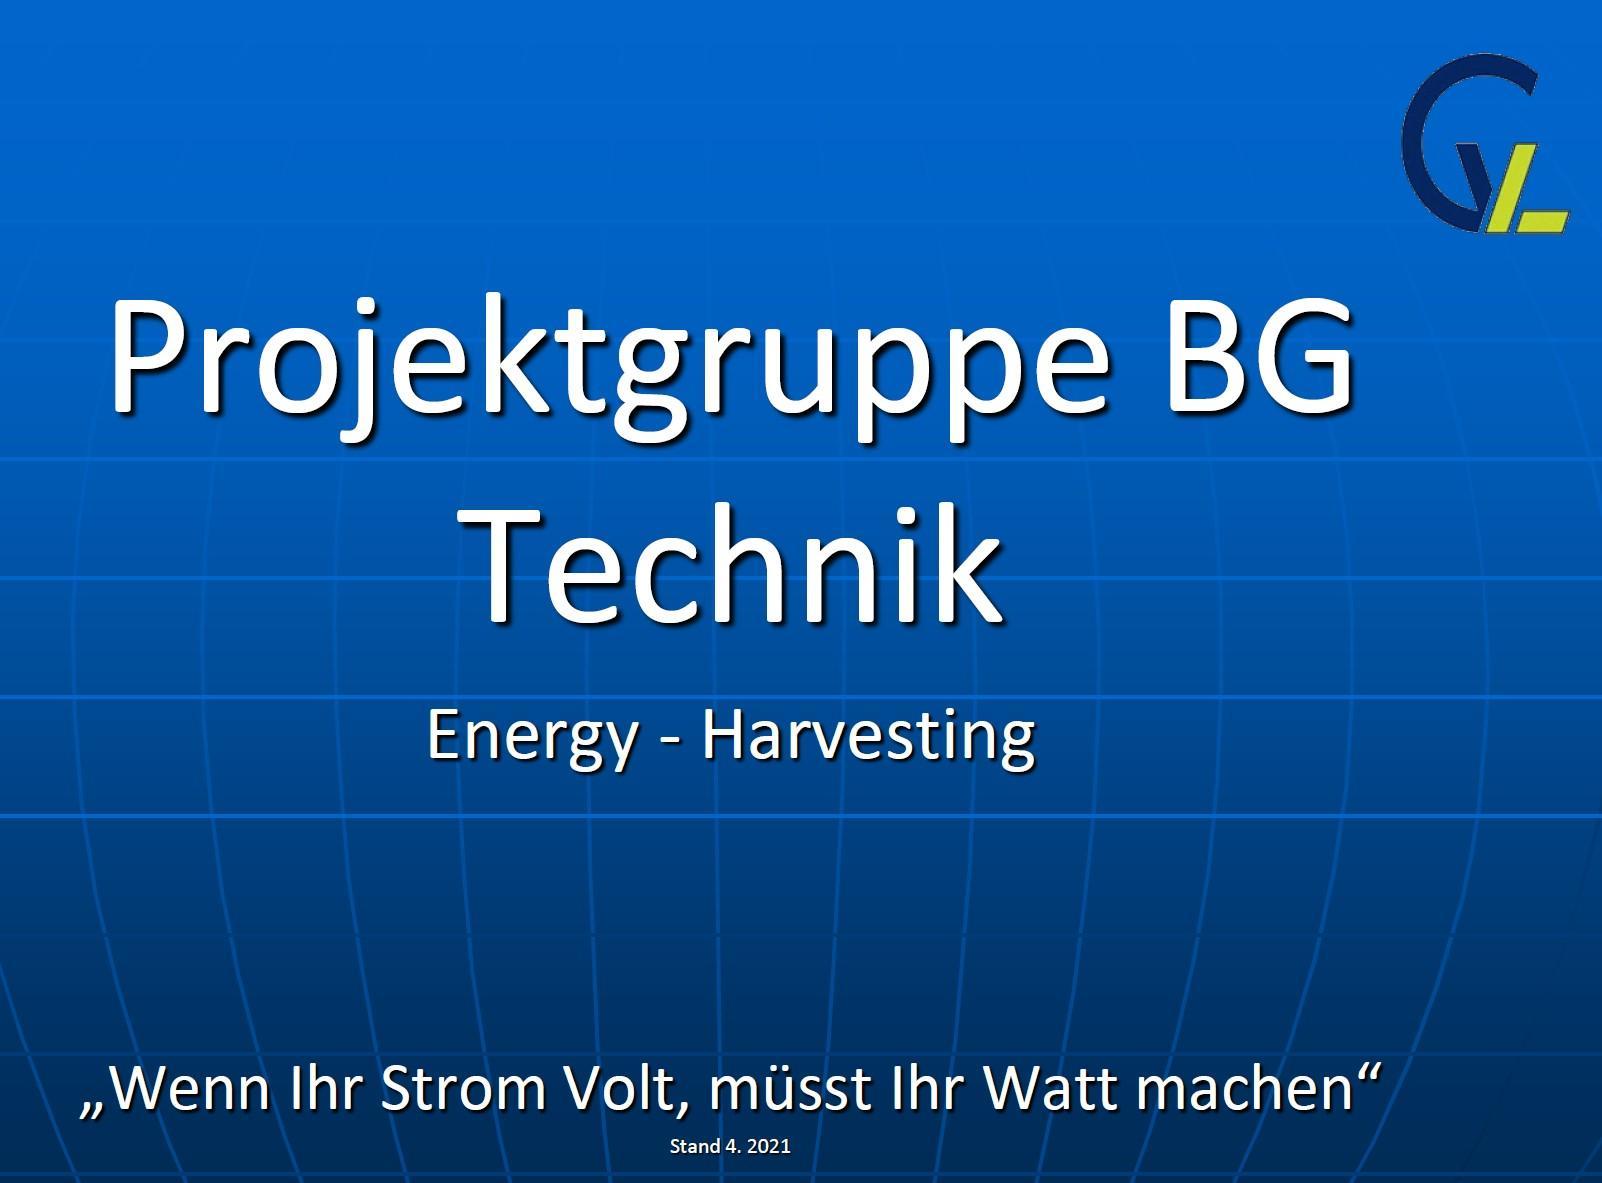 BG Klimaprojekt